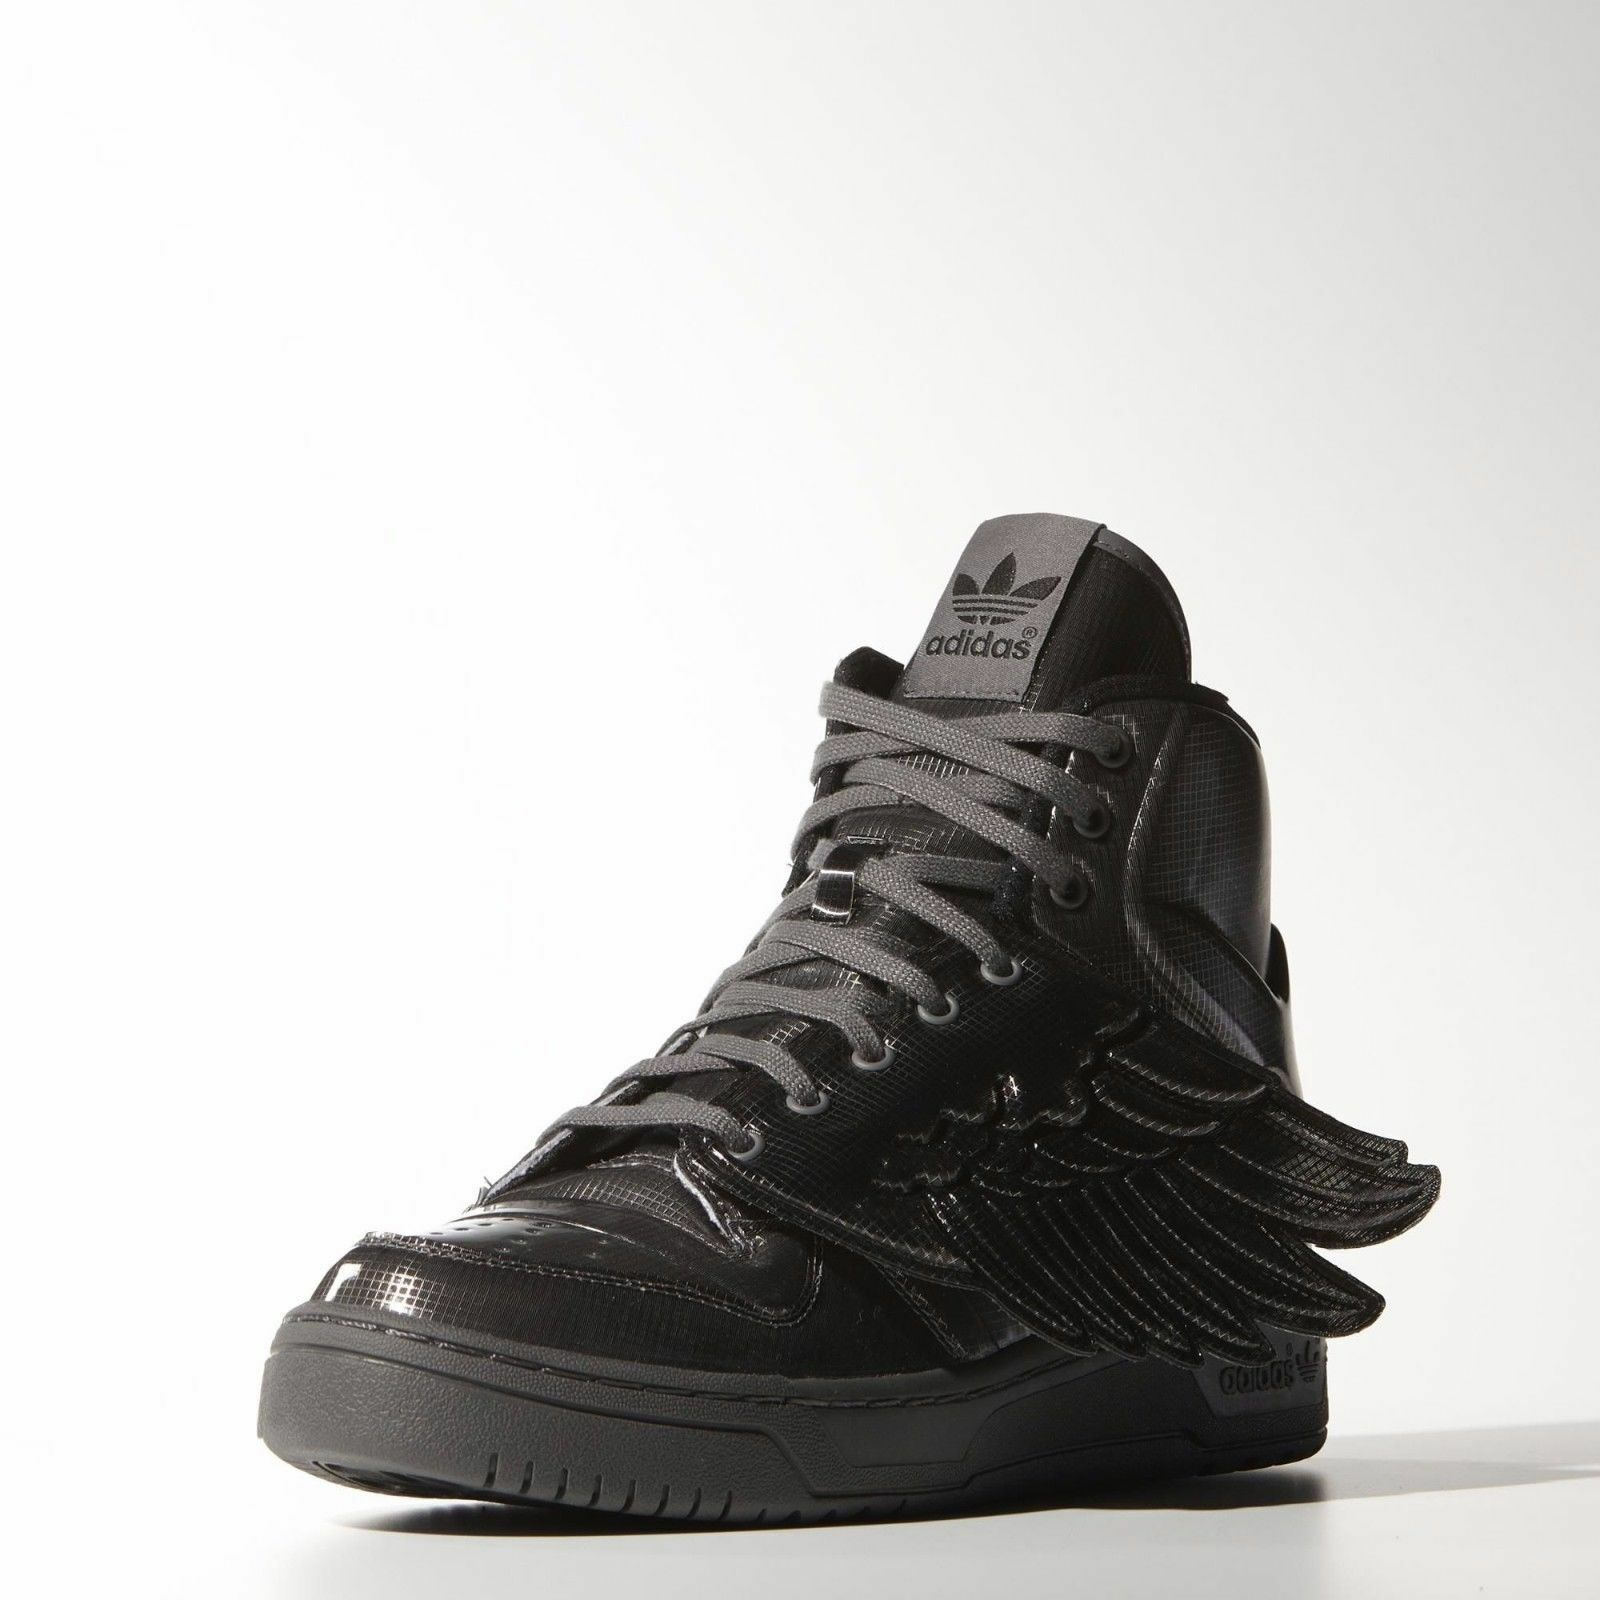 Adidas Men's Jeremy Scott Wings Molded Shoes Size 10.5 us M29014 LAST PAIR